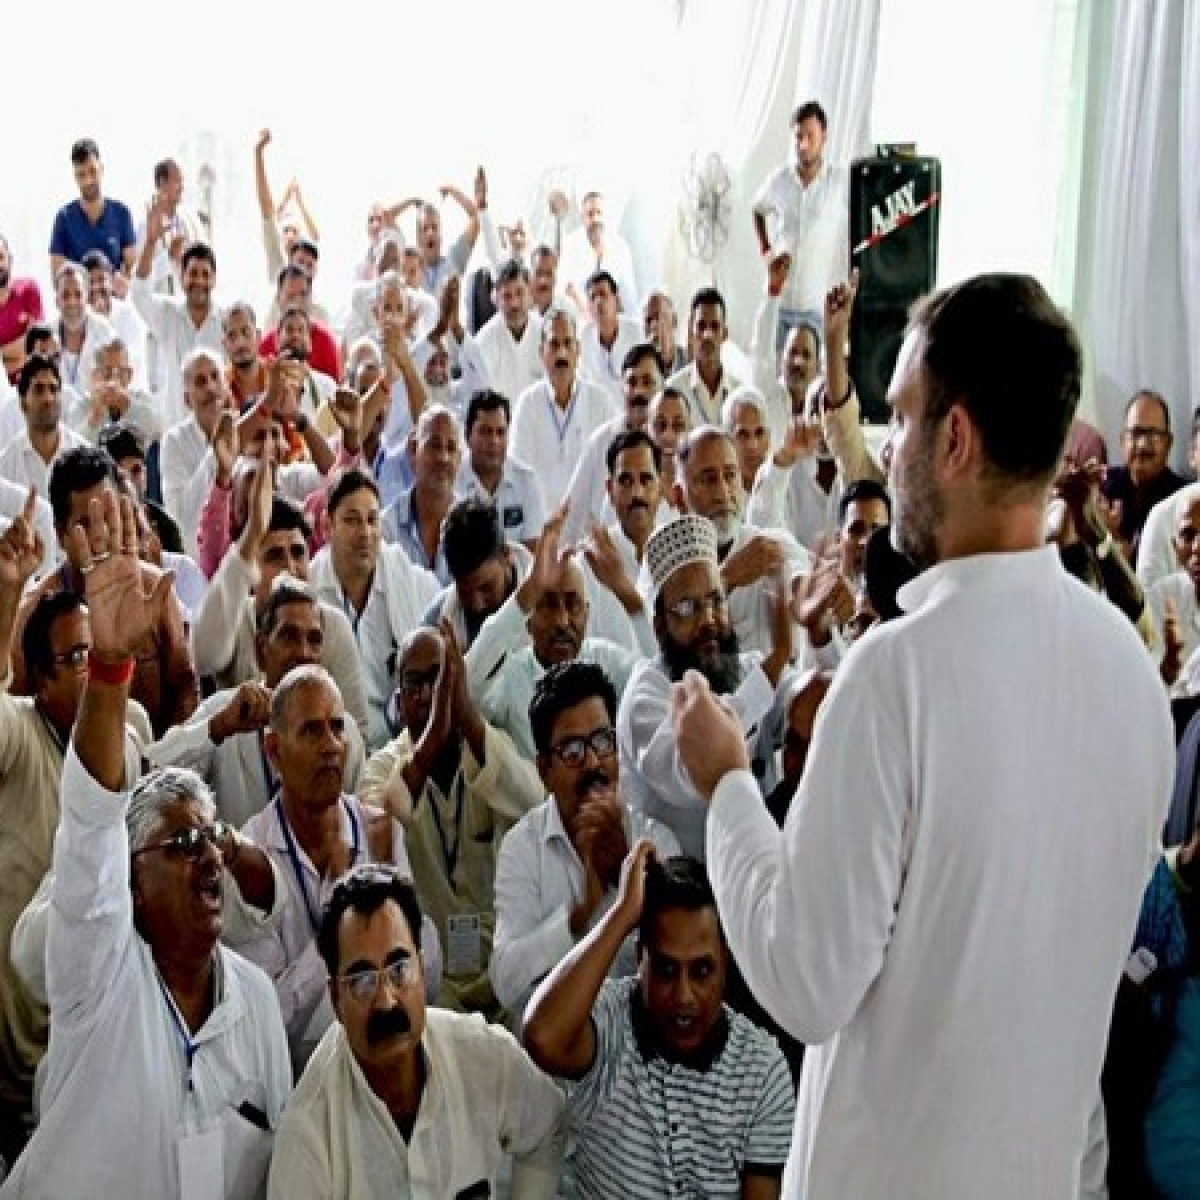 Amethi: Opposition's work 'easy, enjoyable', says Rahul Gandhi